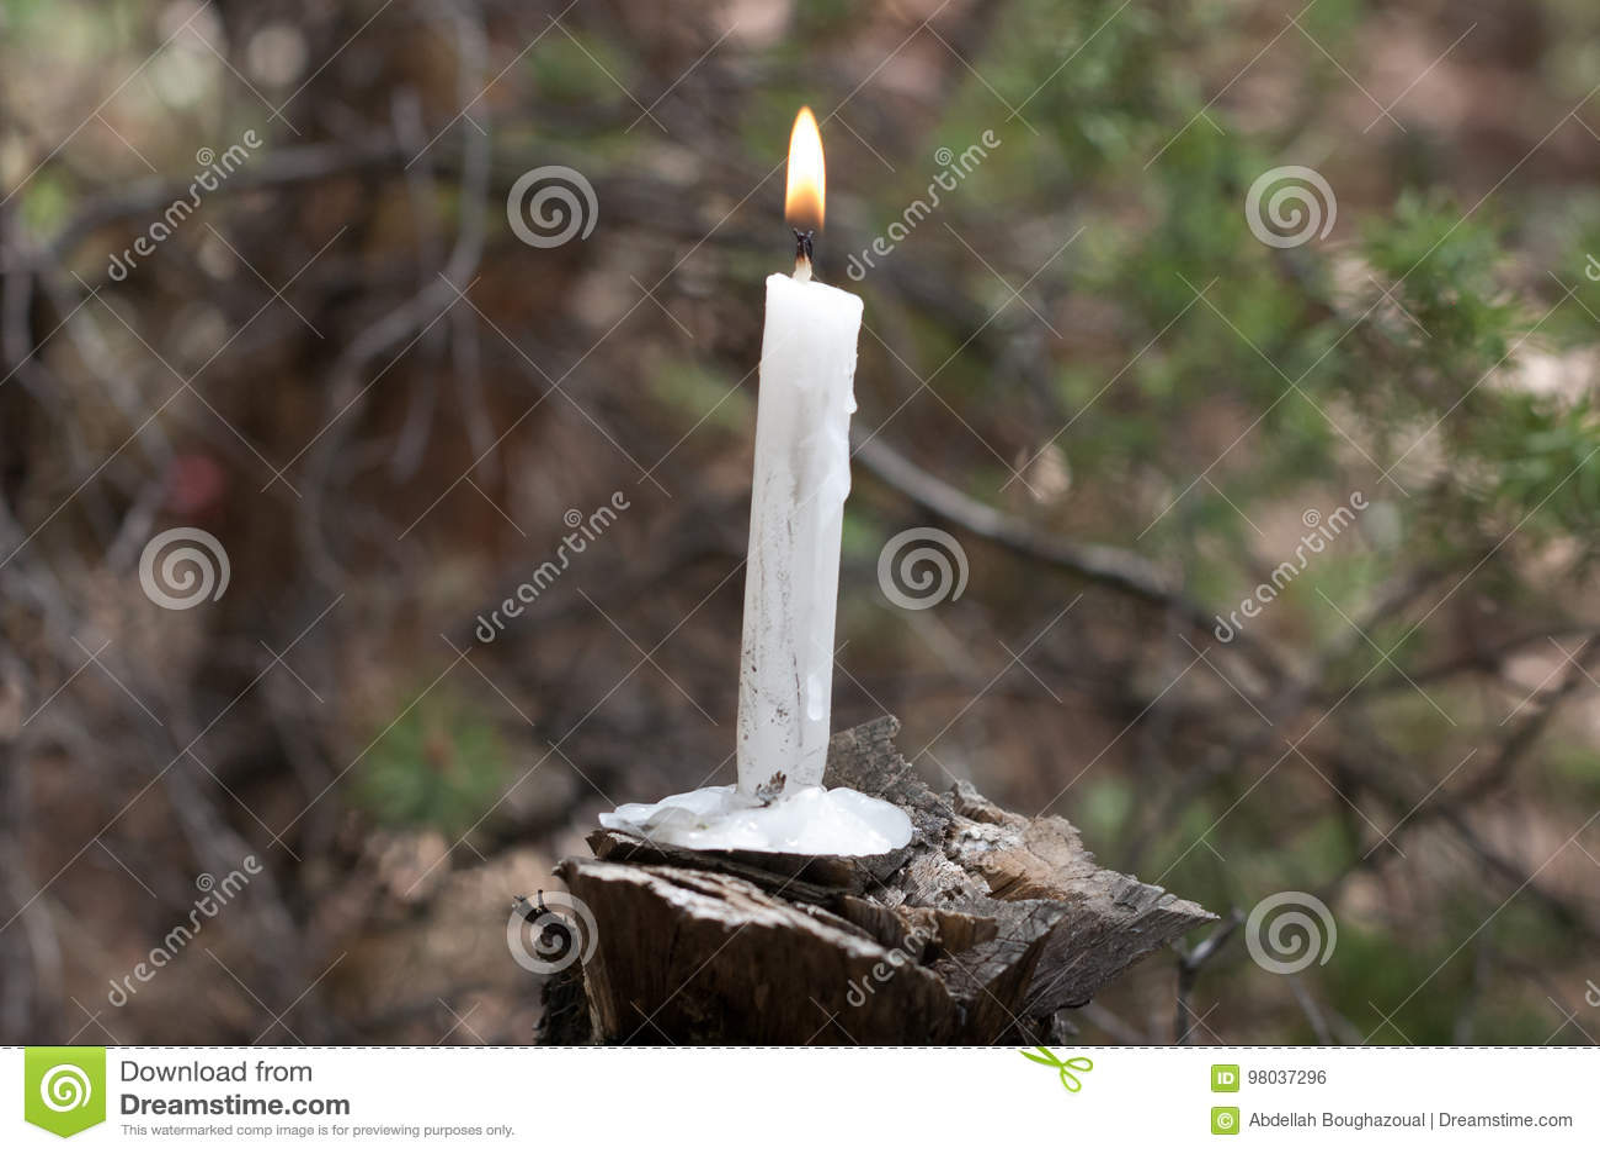 Brennende Kerze auf Holz